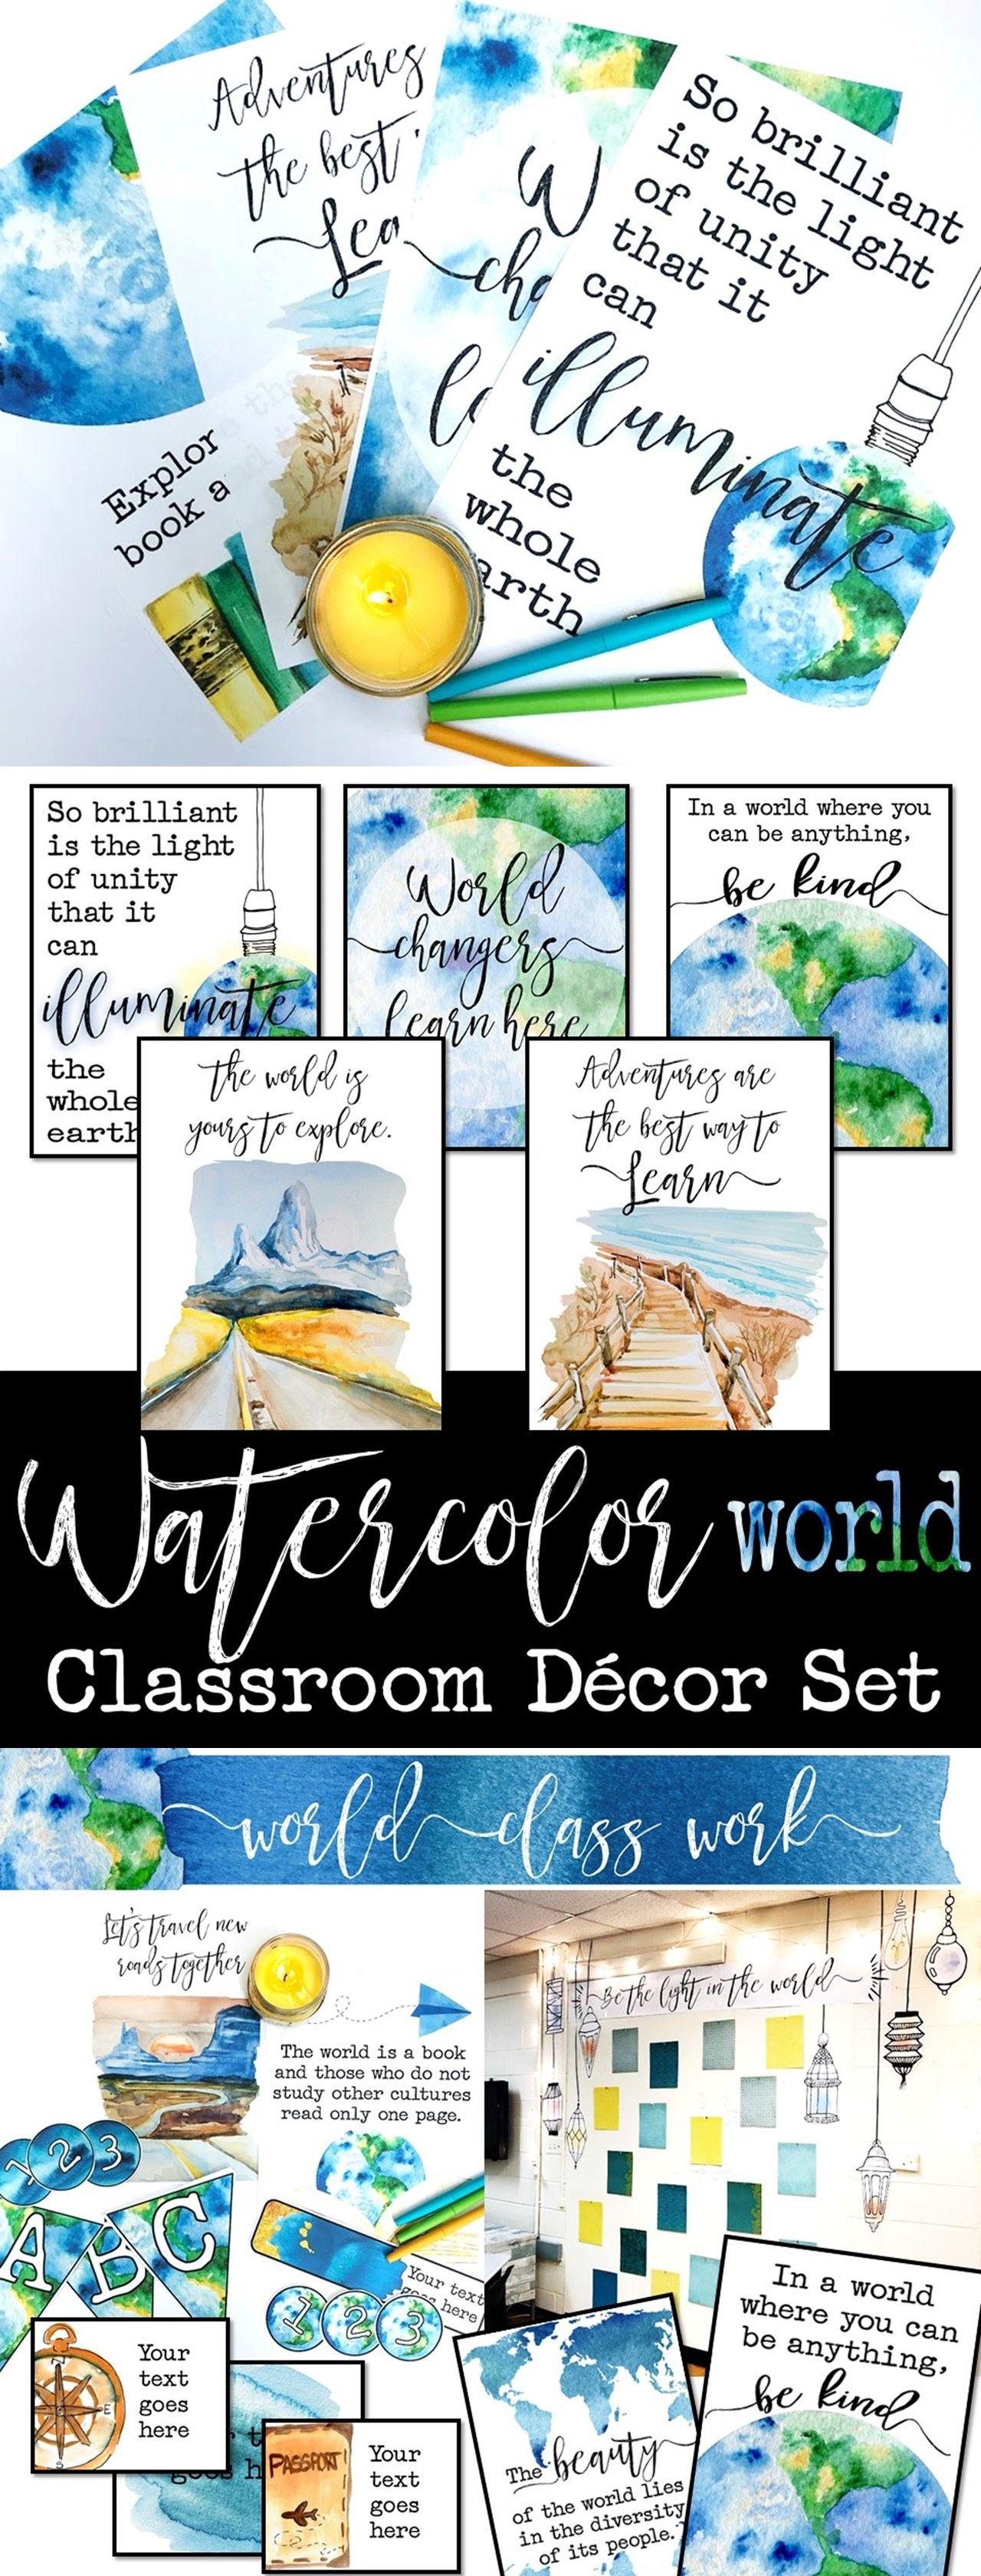 Watercolor World Classroom Decor: World Literature, Geography, History #classroomdecor